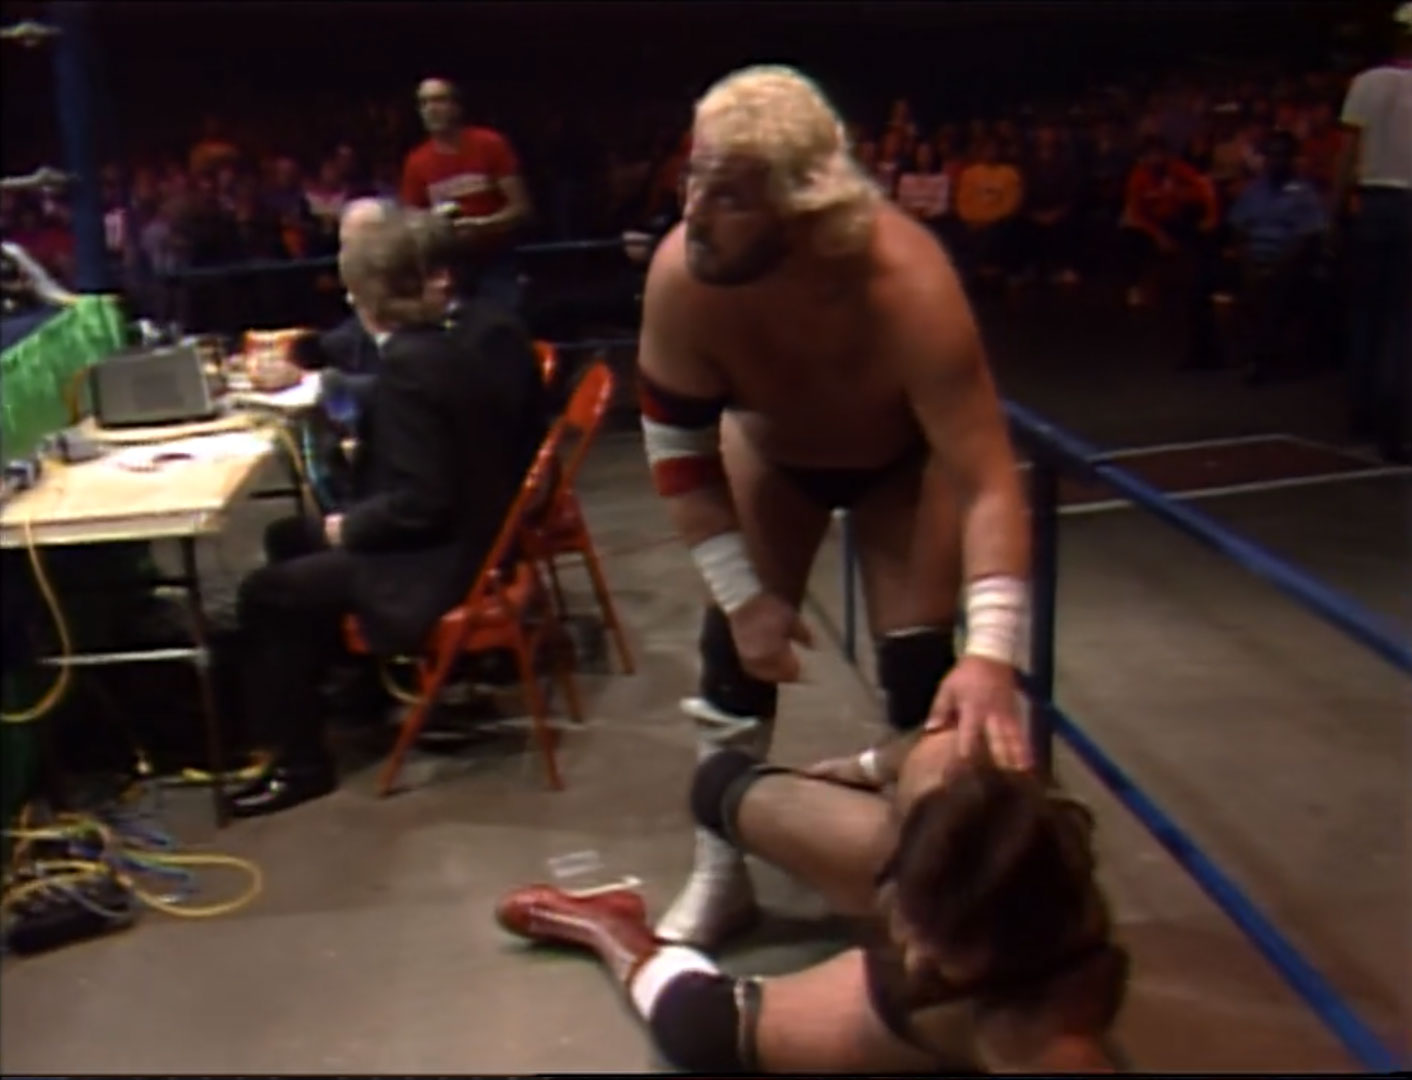 The Kansas Jayhawks vs. The Russians NWA United States Tag Team Championship NWA Starrcade 86, Nov 27th 1986